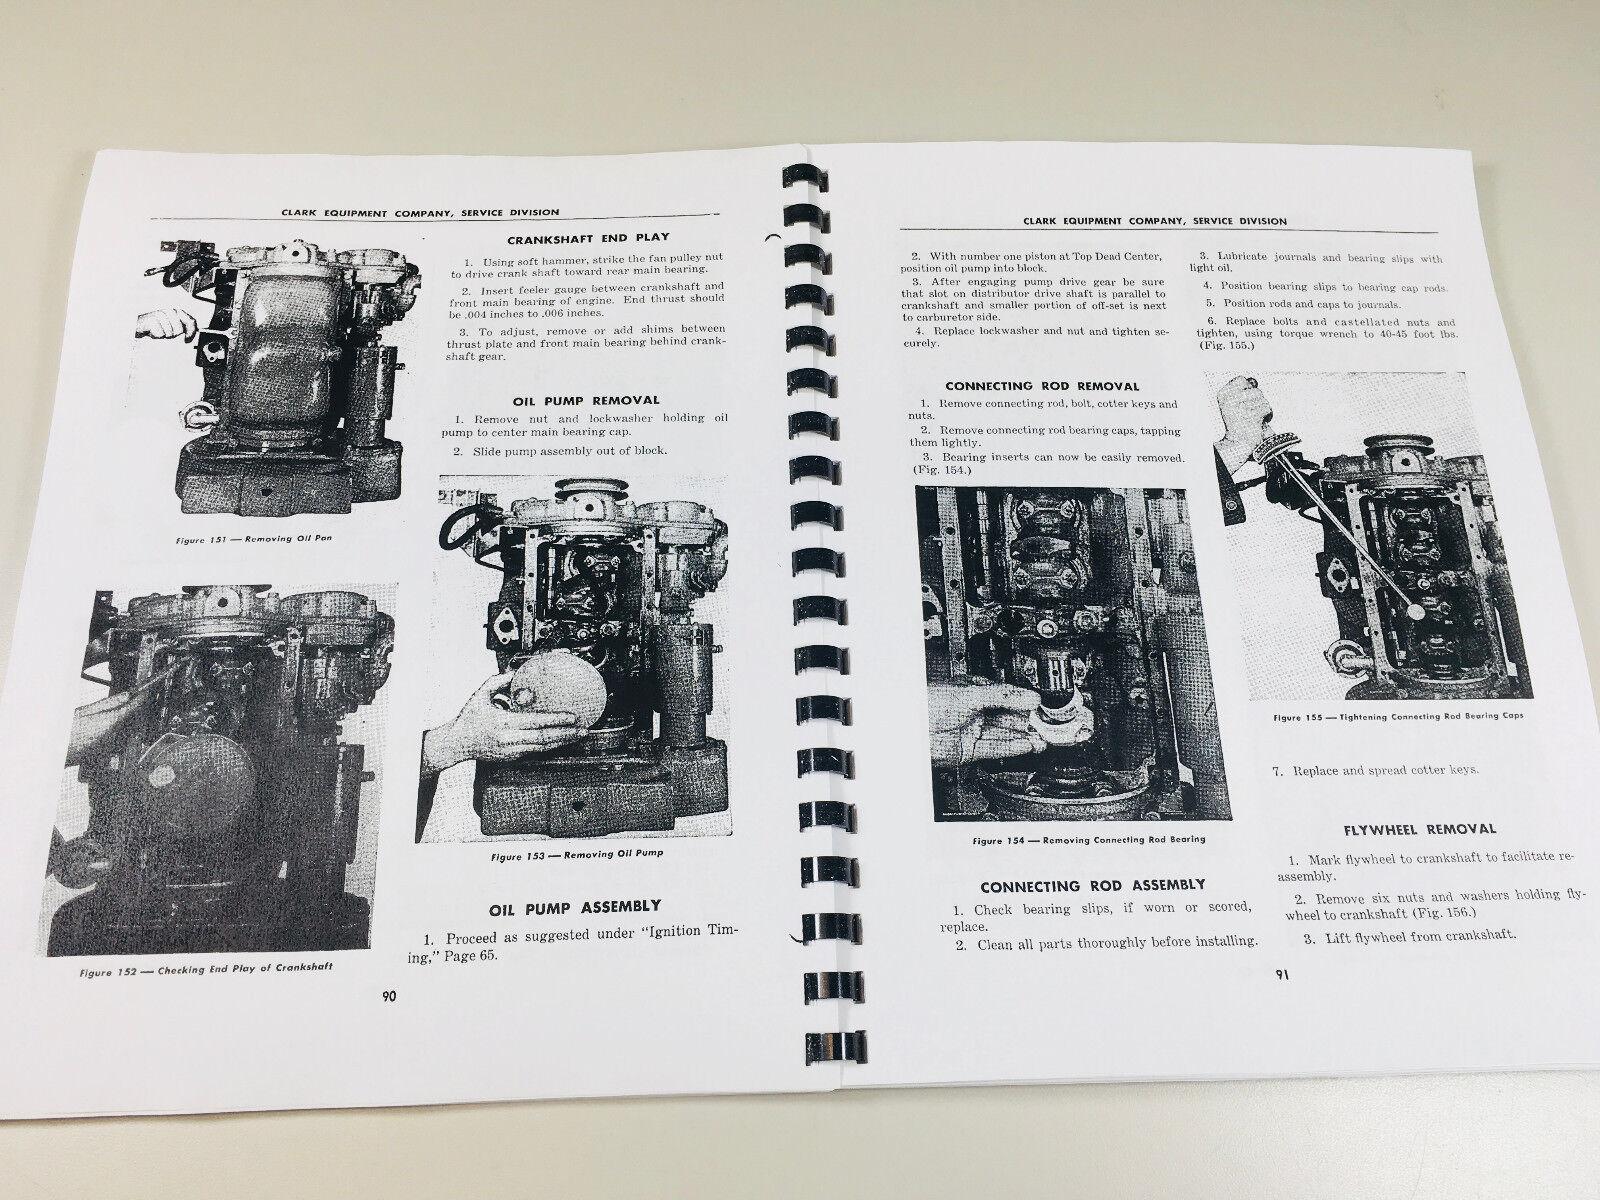 New reproductions of OEM Original Equipment Manufacturers manuals.